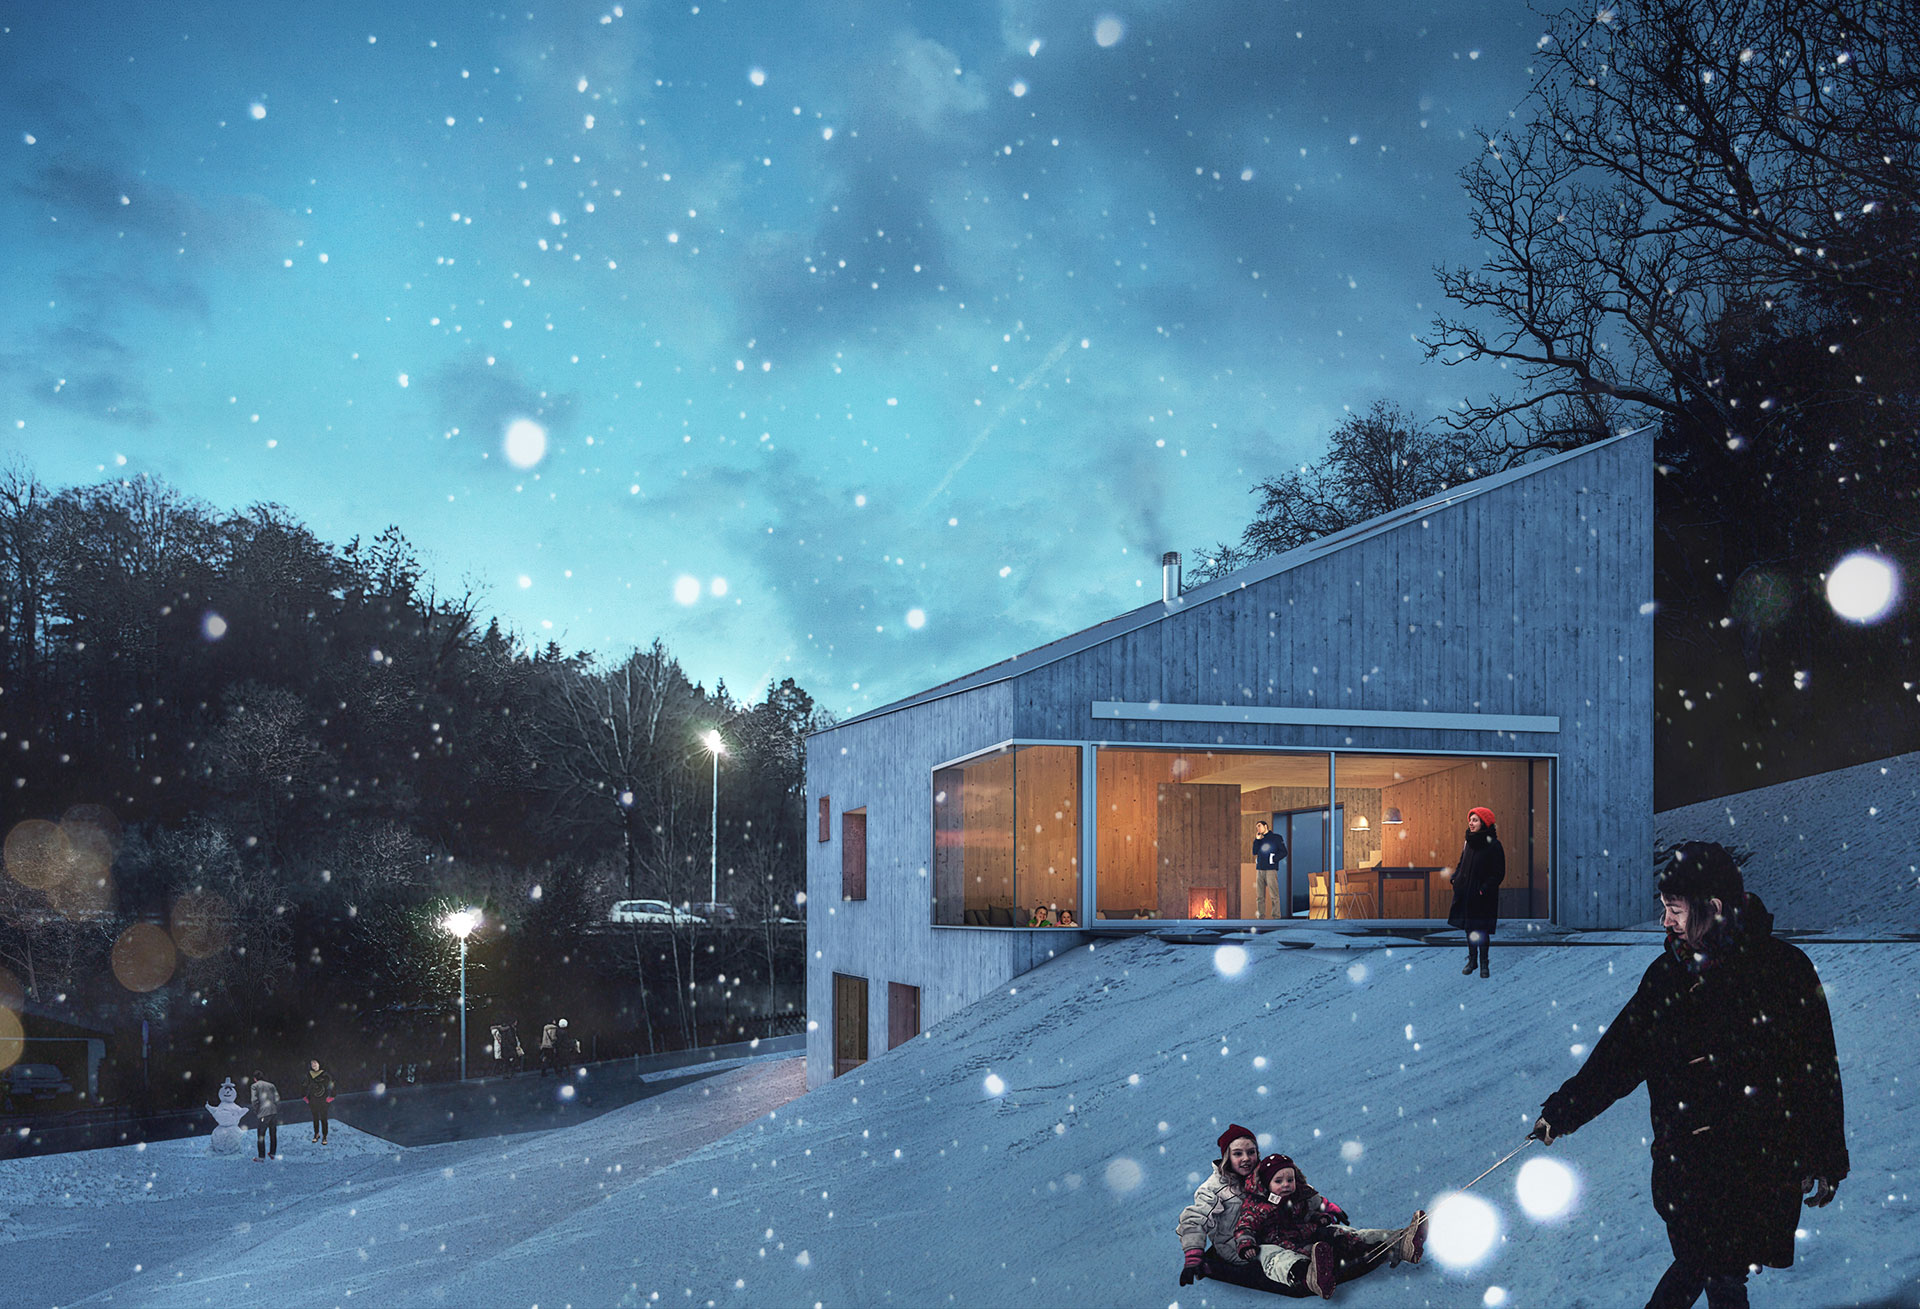 Berghaus / Wangen, Germany / Wezel Evers Architektur